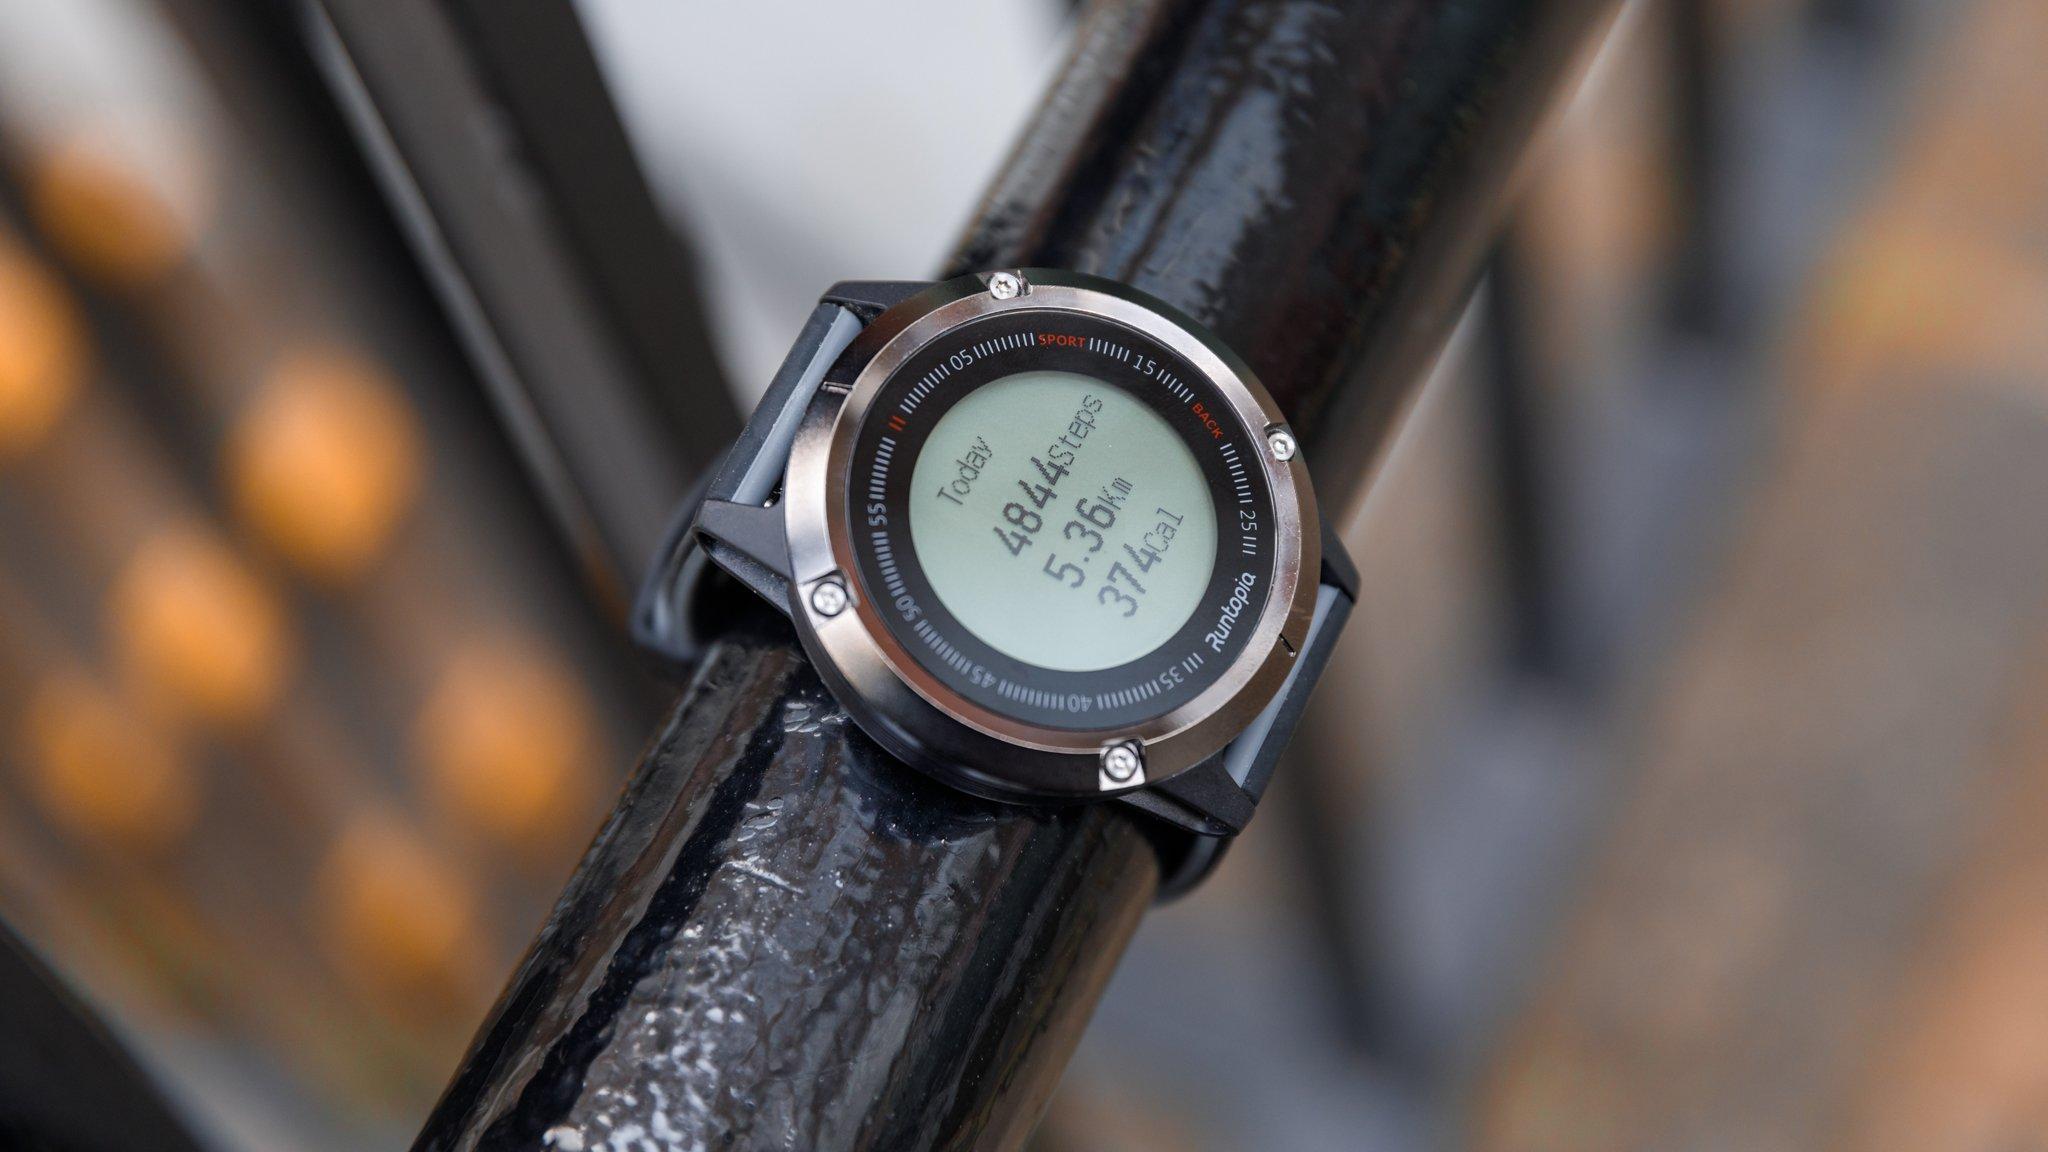 Runtopia S1 review: A cheap but functional running watch